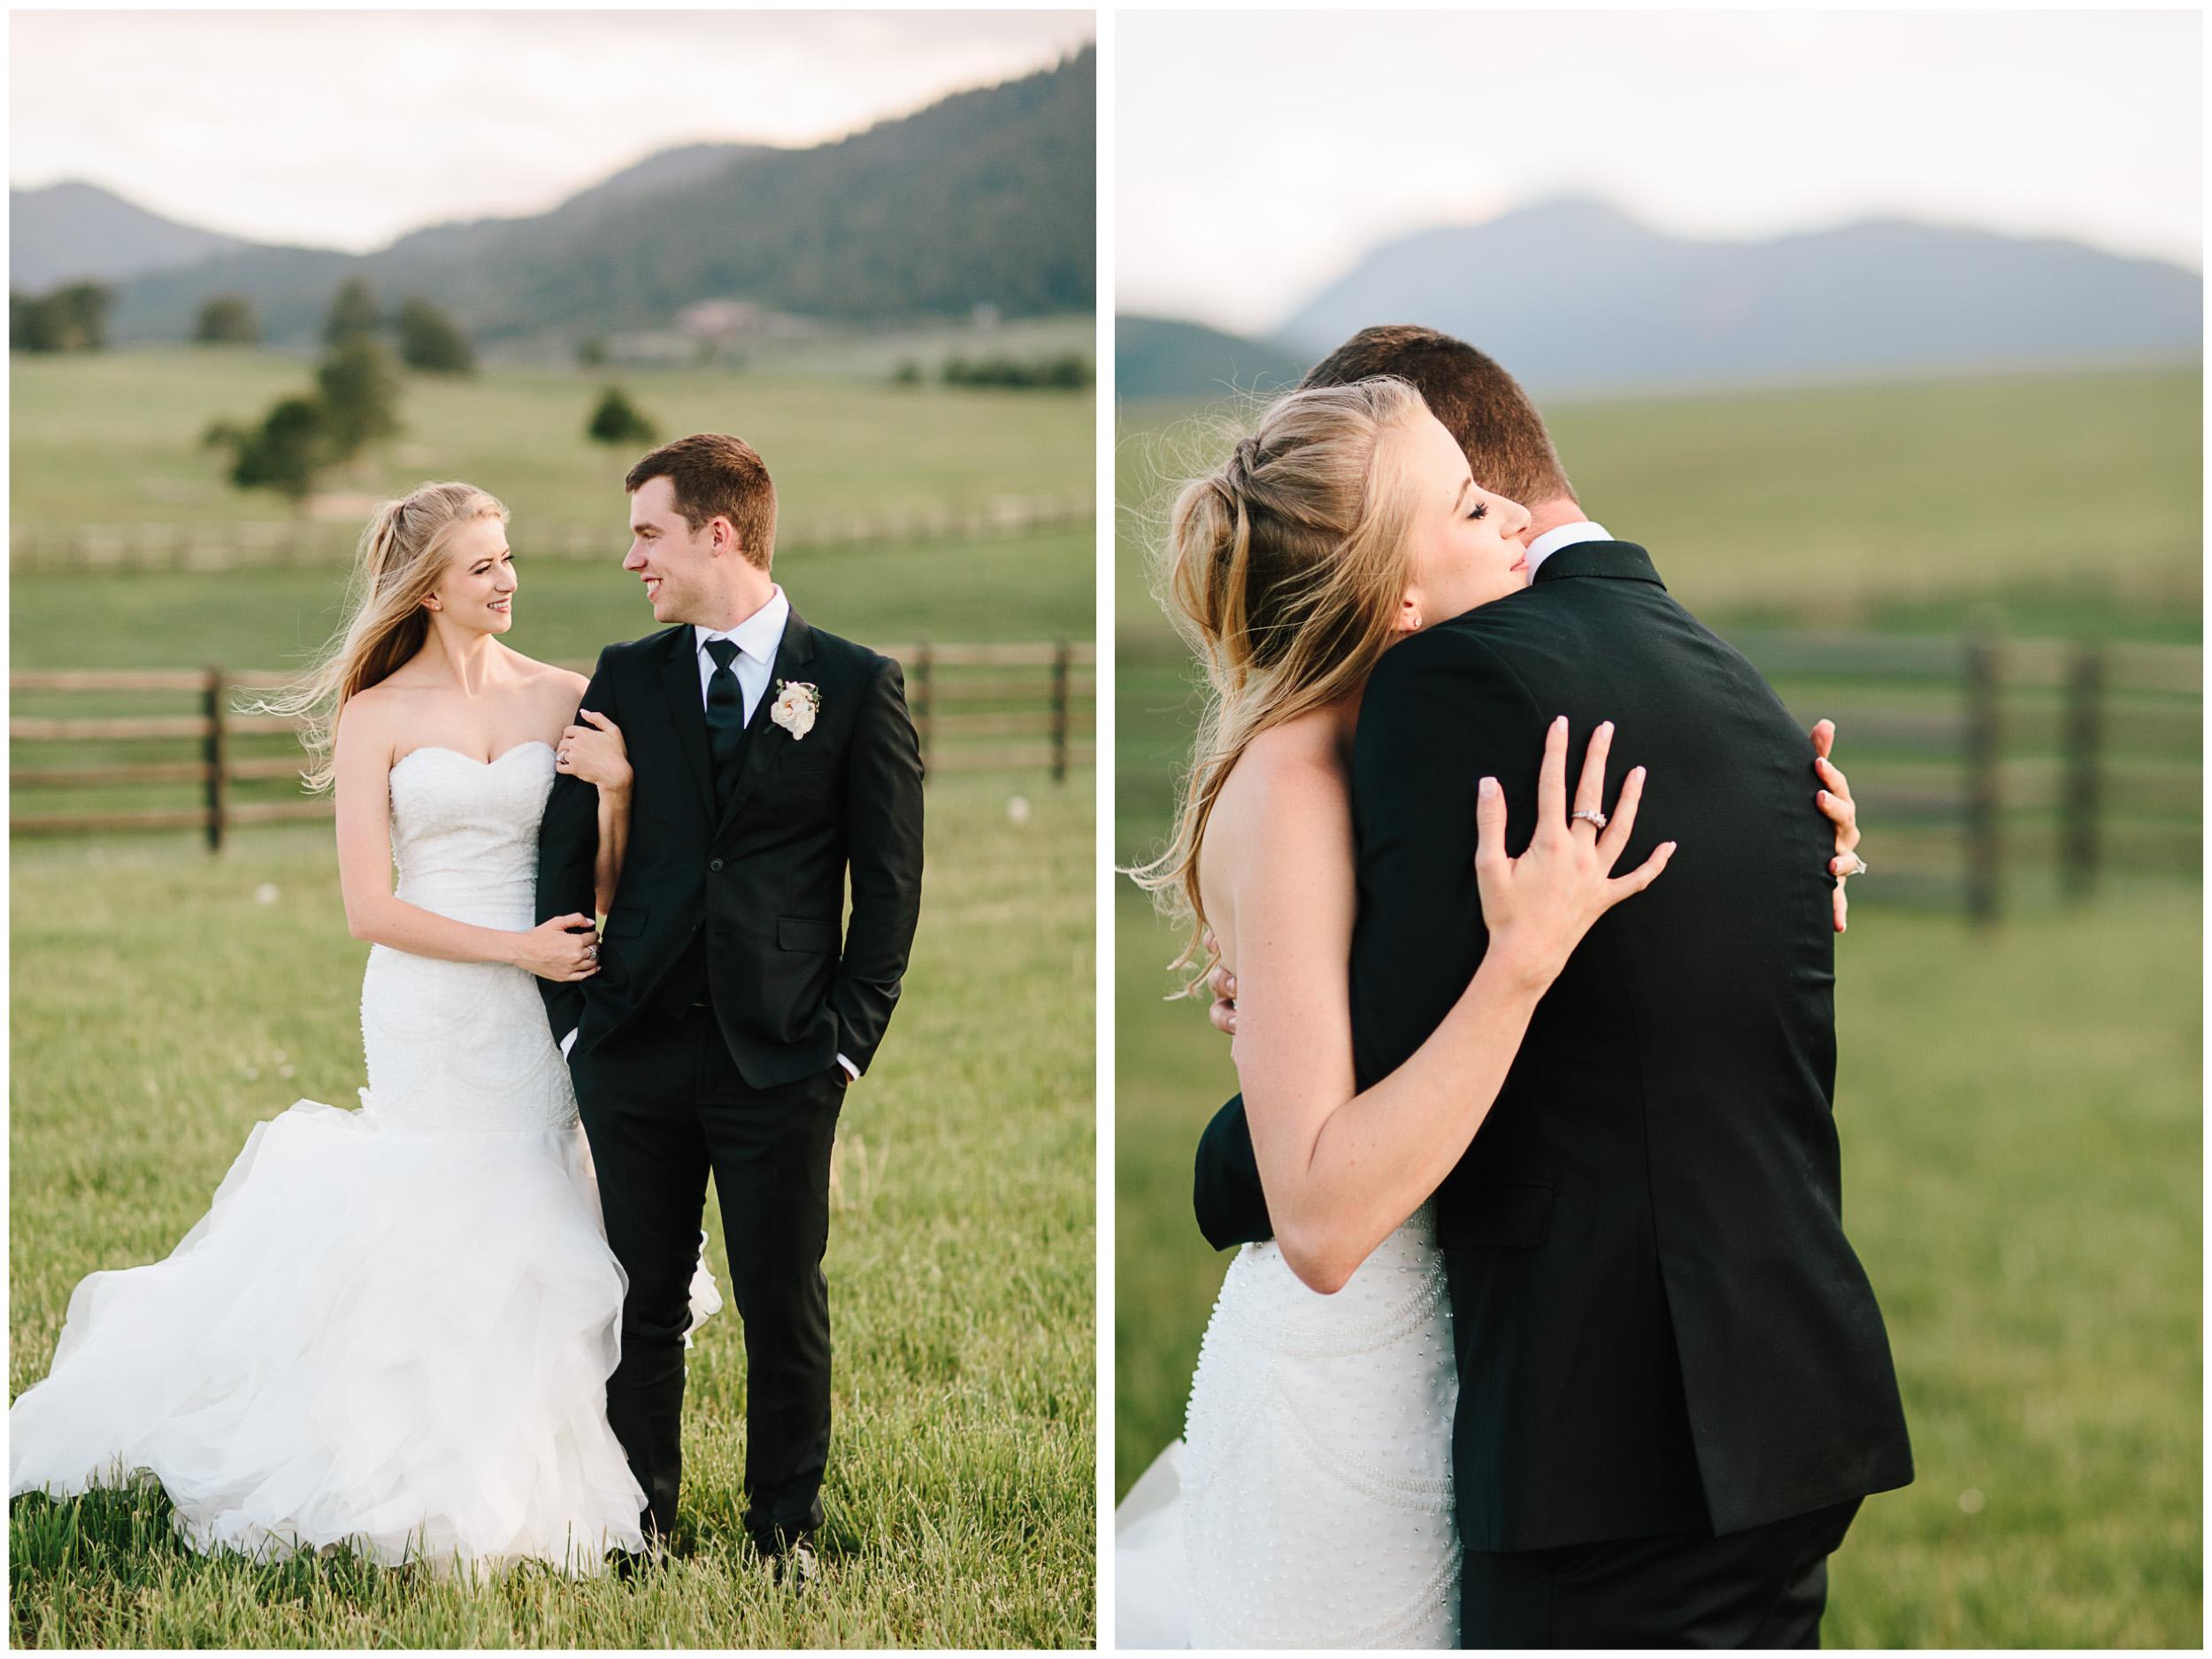 spruce_mountain_ranch_wedding_62.jpg